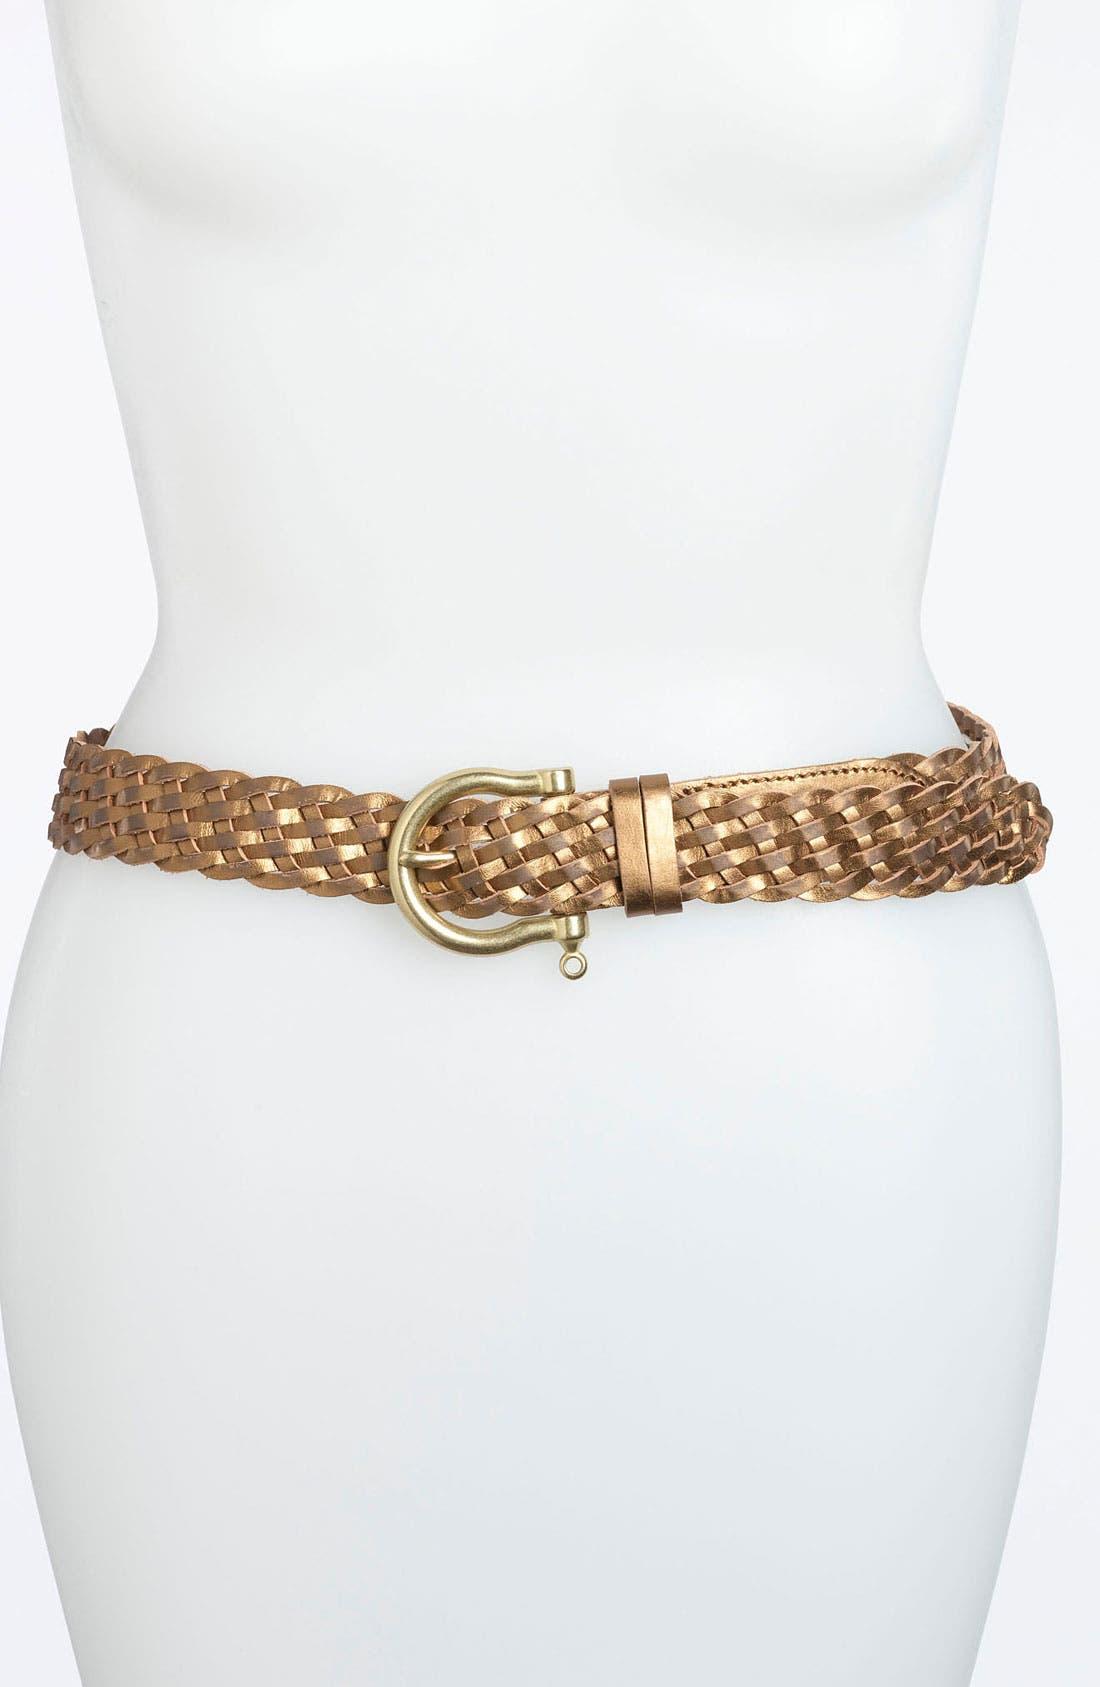 Alternate Image 1 Selected - Sperry Top-Sider® Metallic Braided Belt